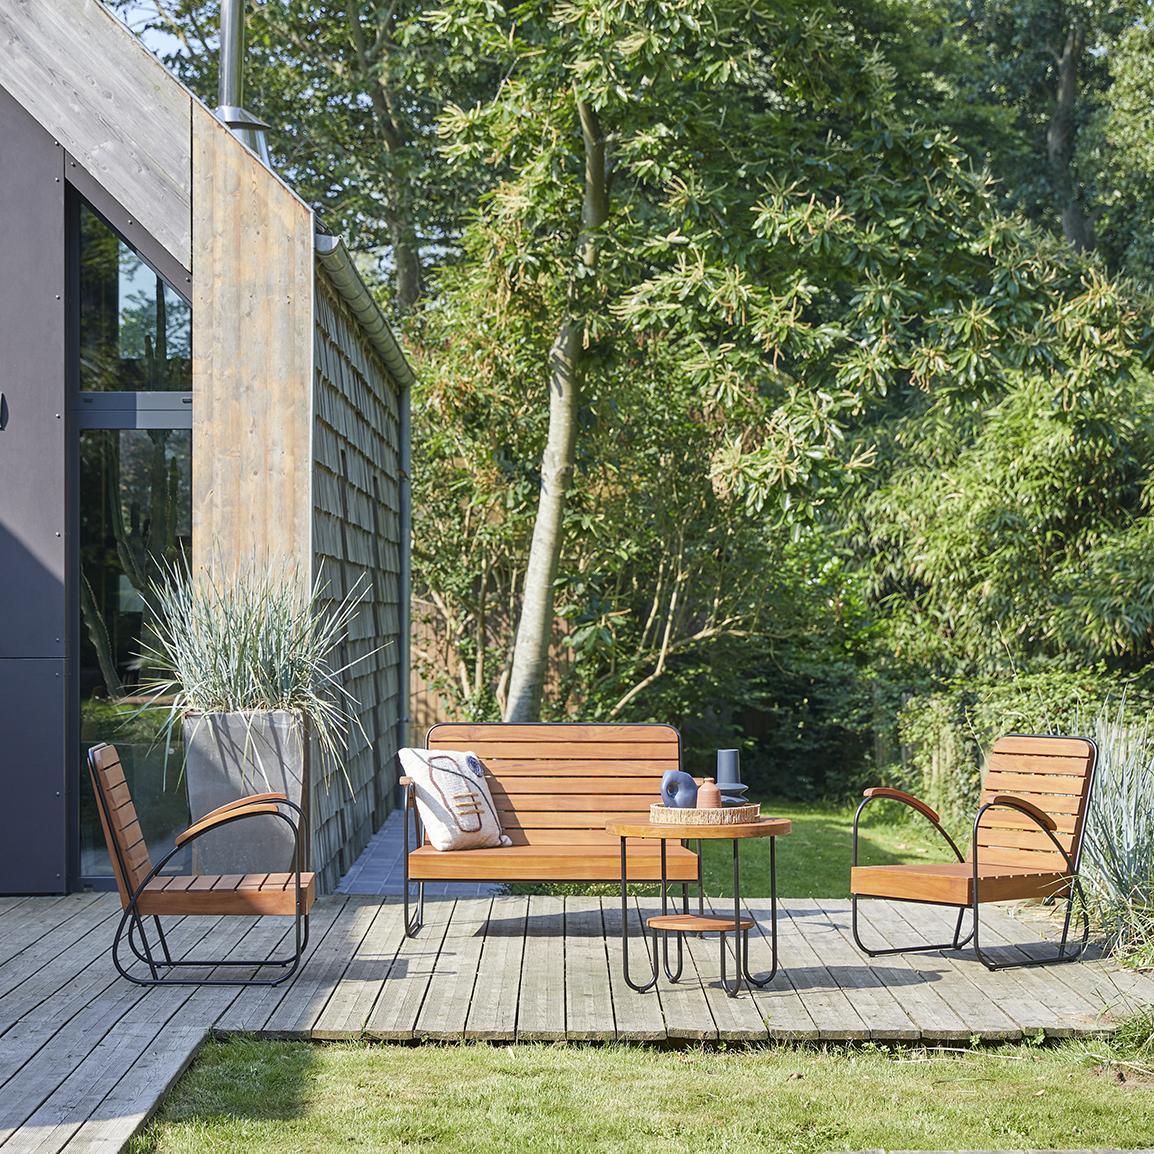 Salon de jardin en teck massif Key Wood 4 places